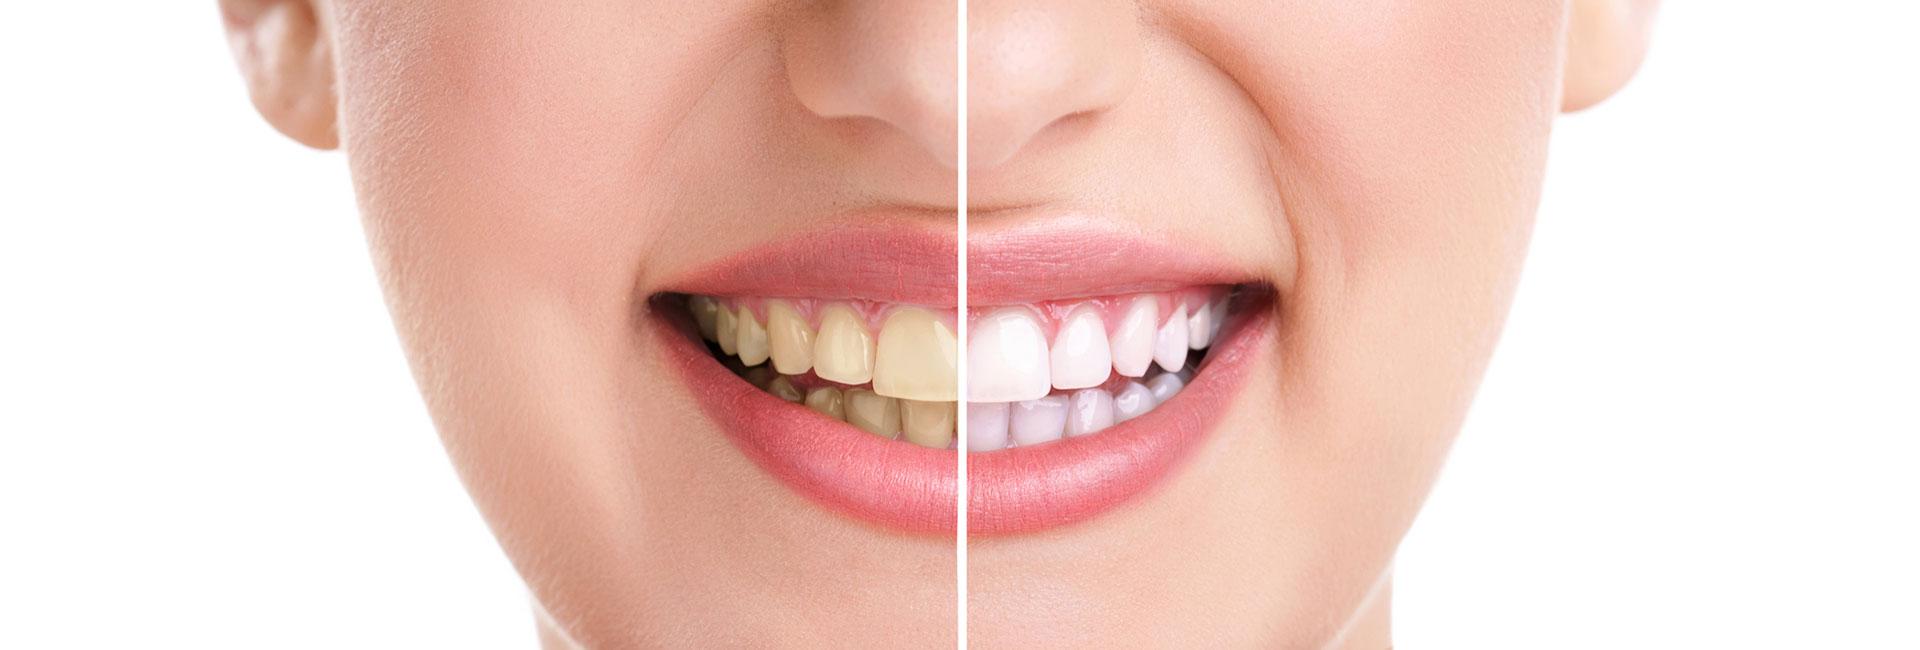 Healthy teeth and smile B